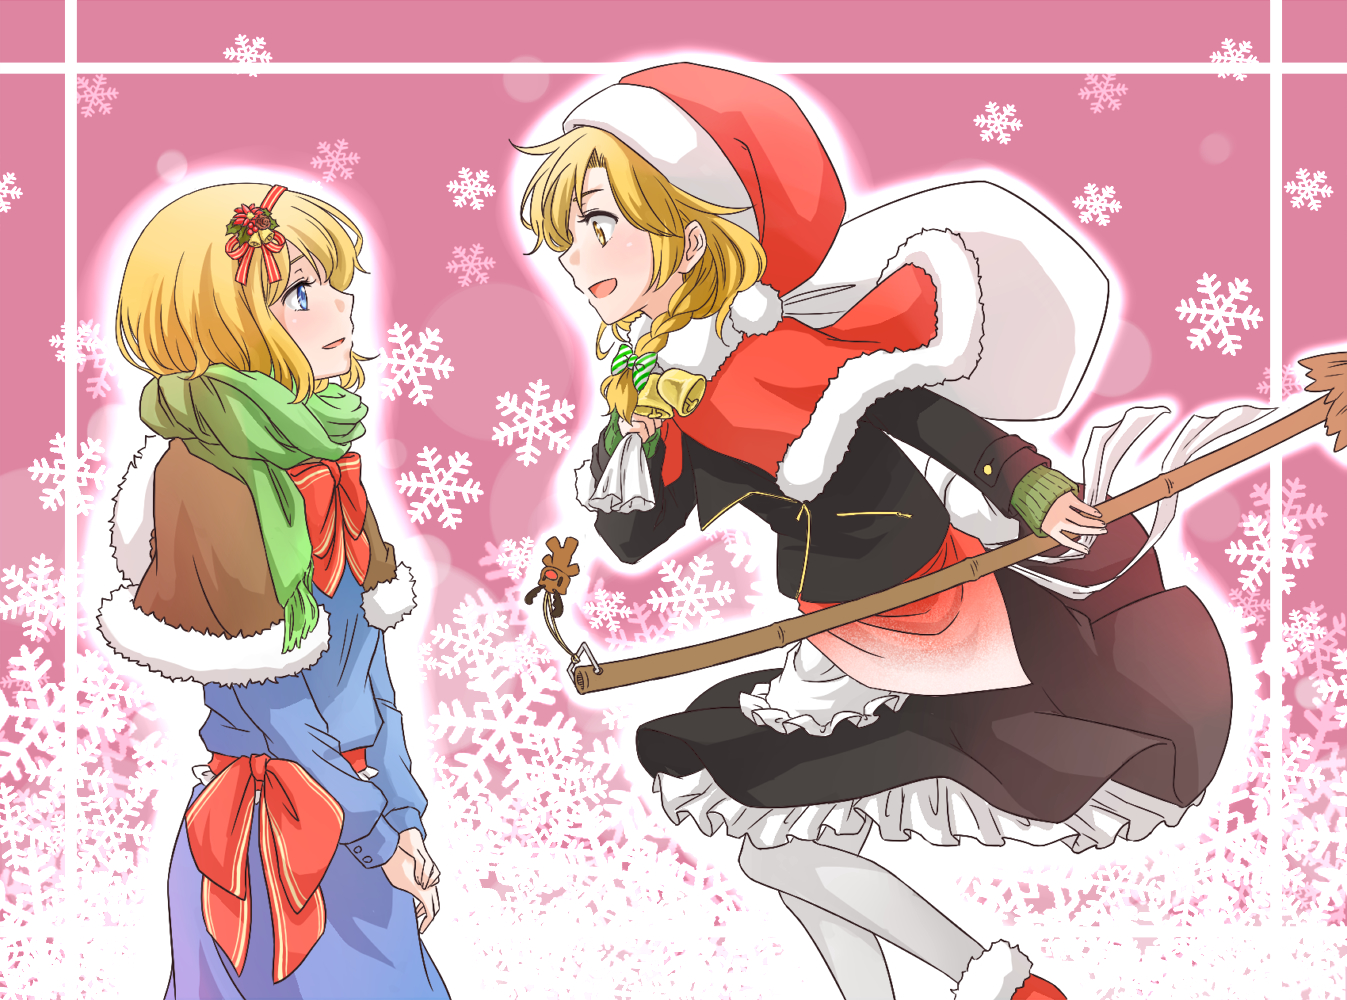 Touhou (Touhou Project) Image #1813713 - Zerochan Anime Image Board